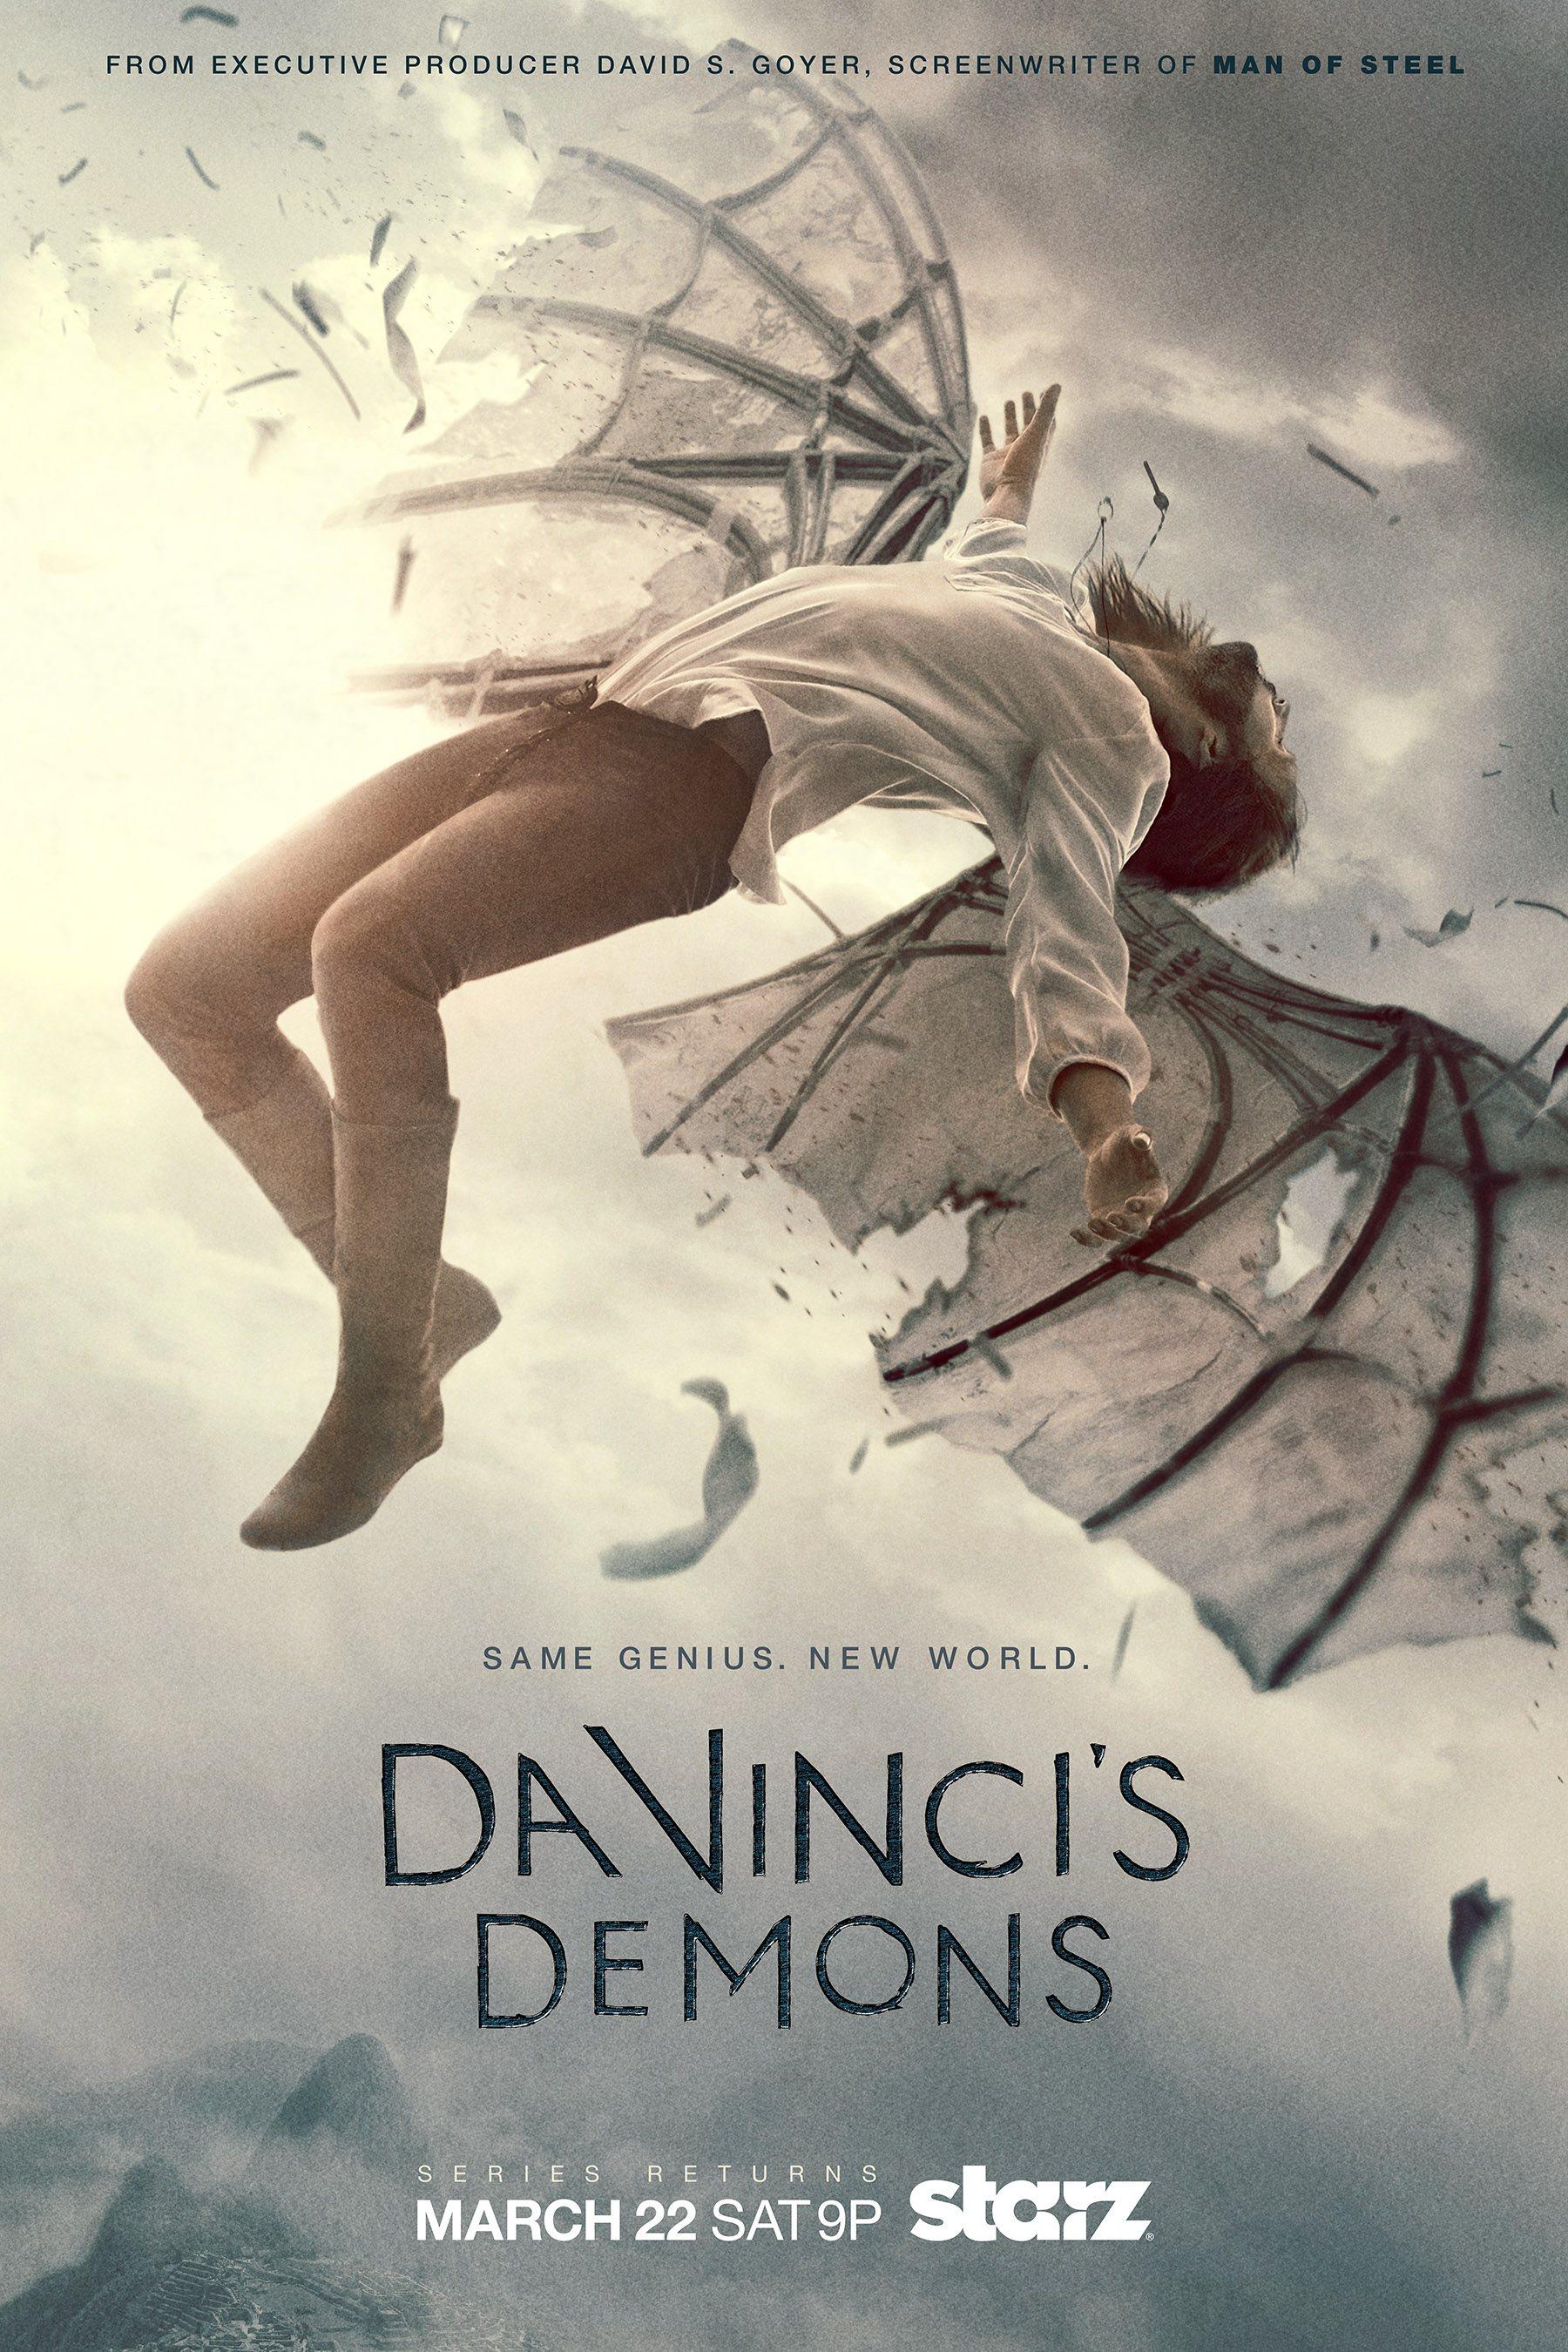 Davincis Demons